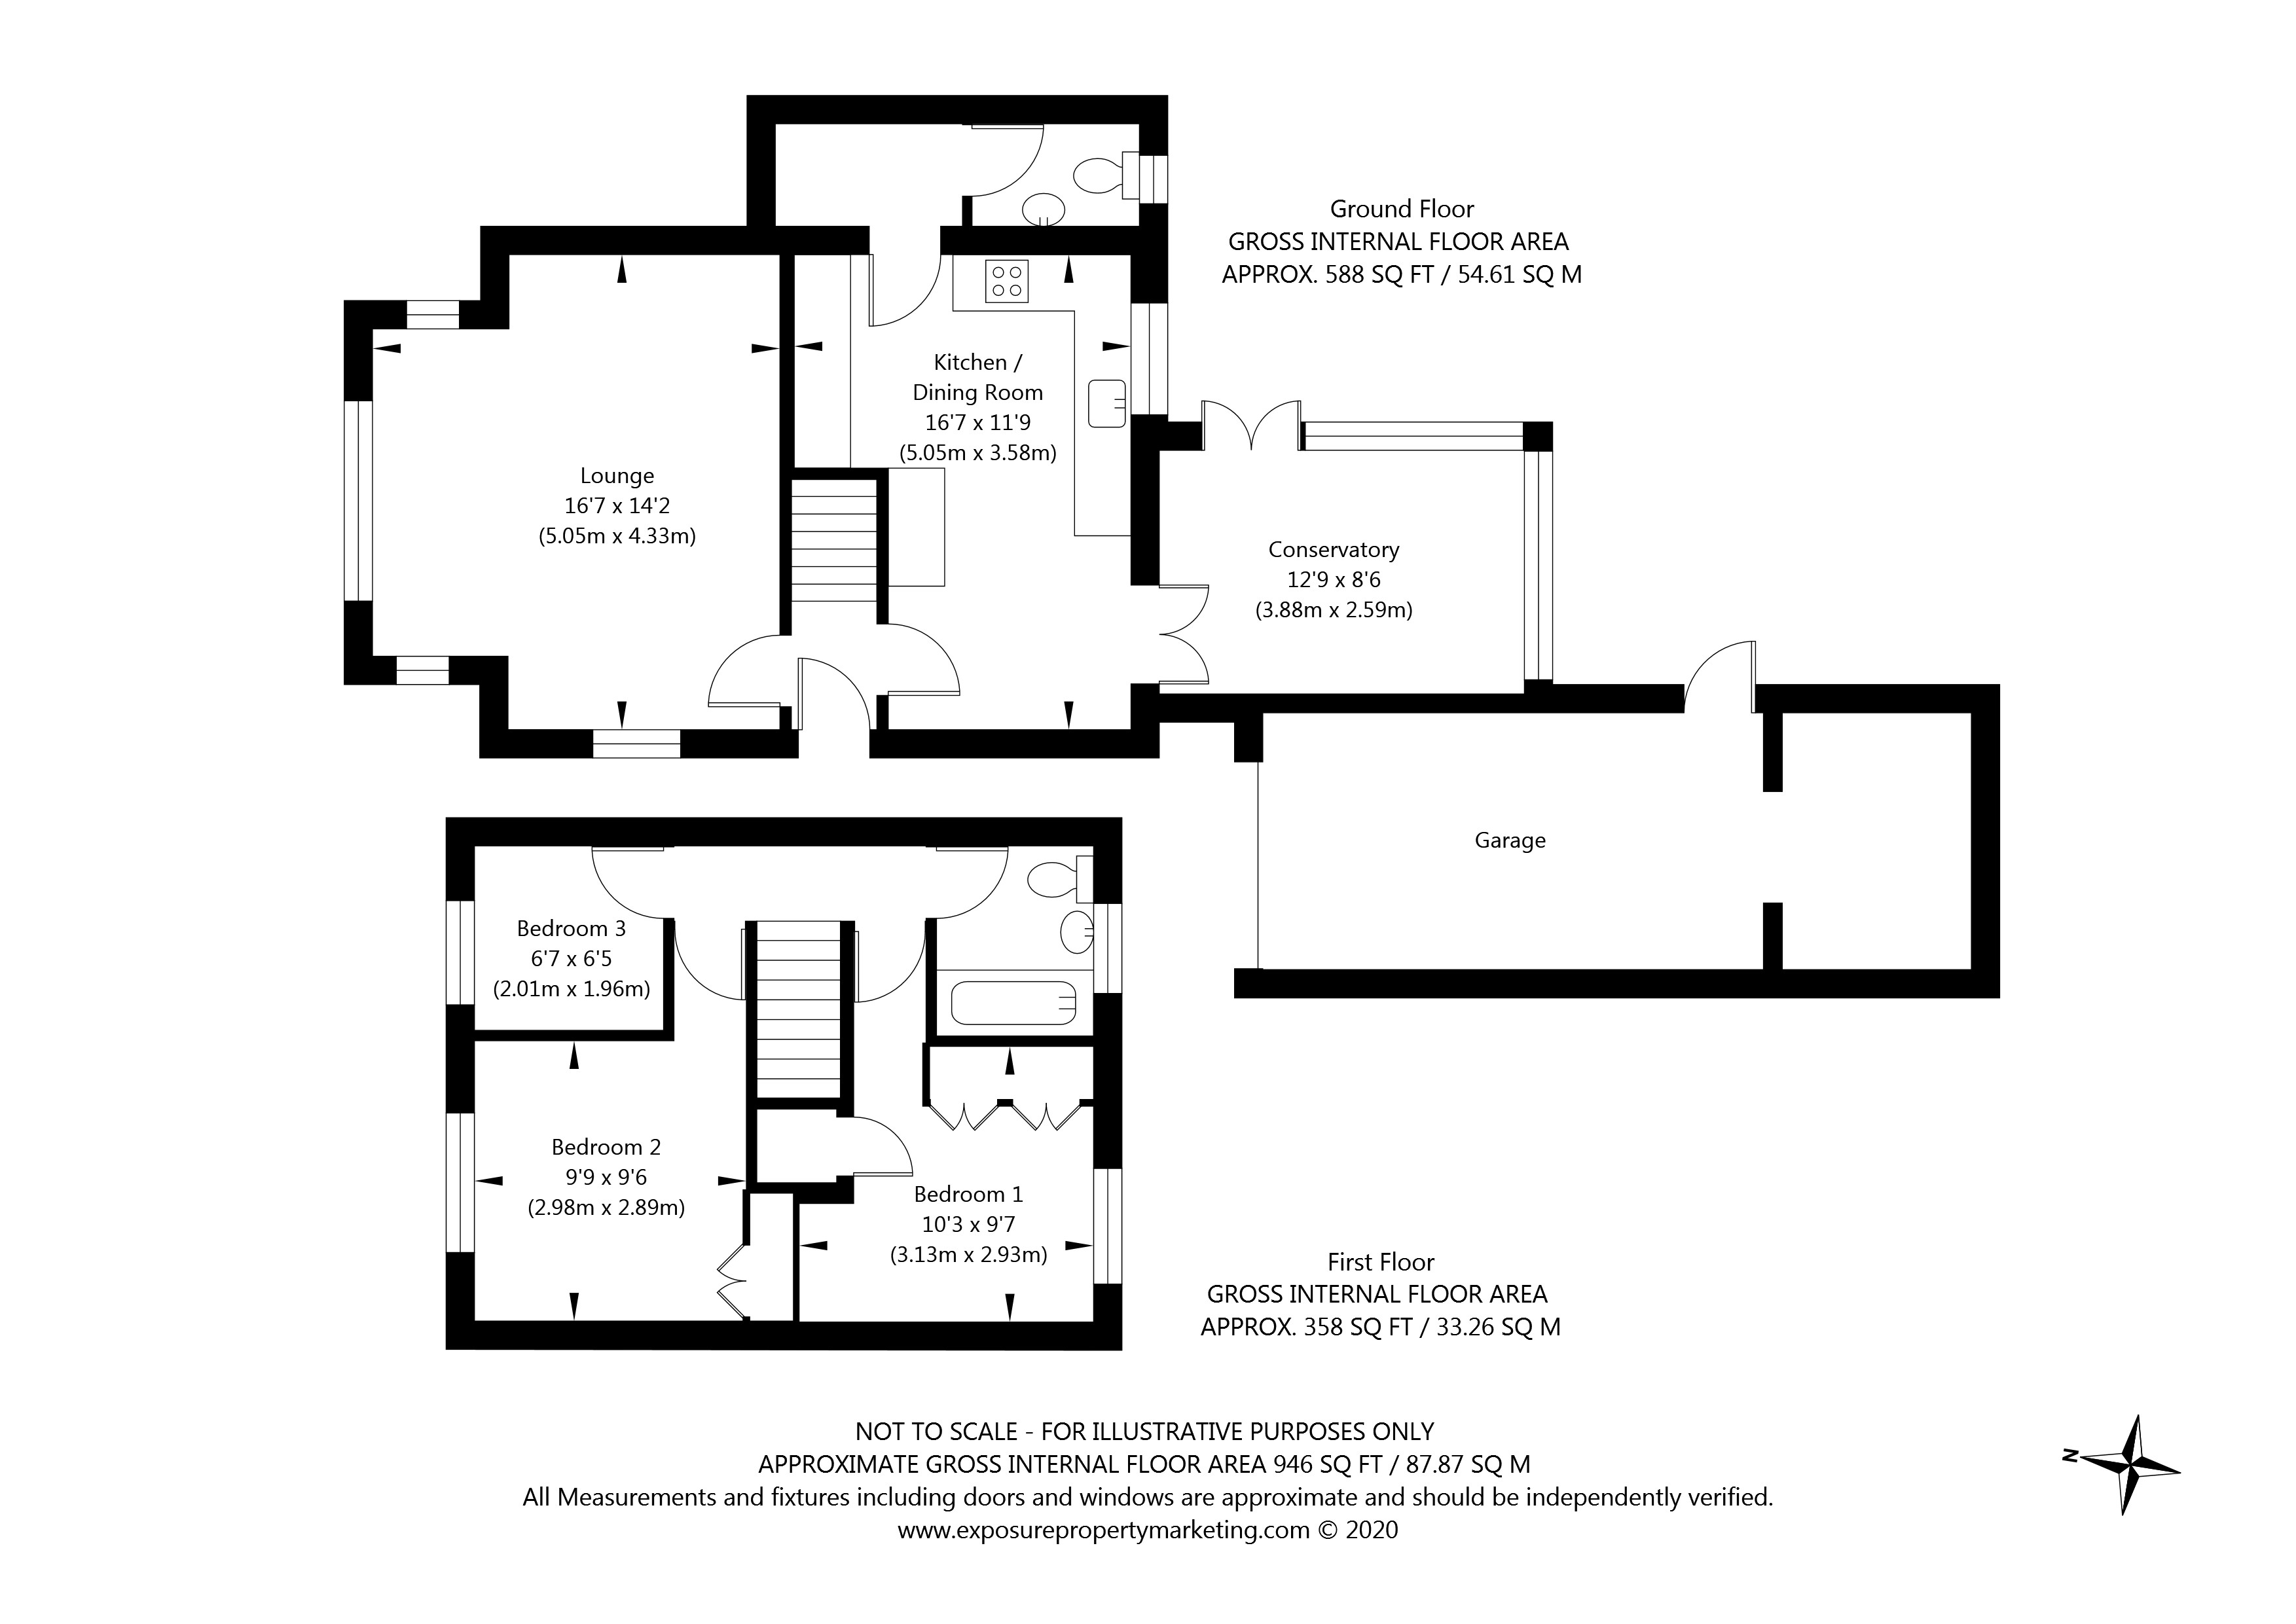 Kelfield Road, Riccall, York property floorplan